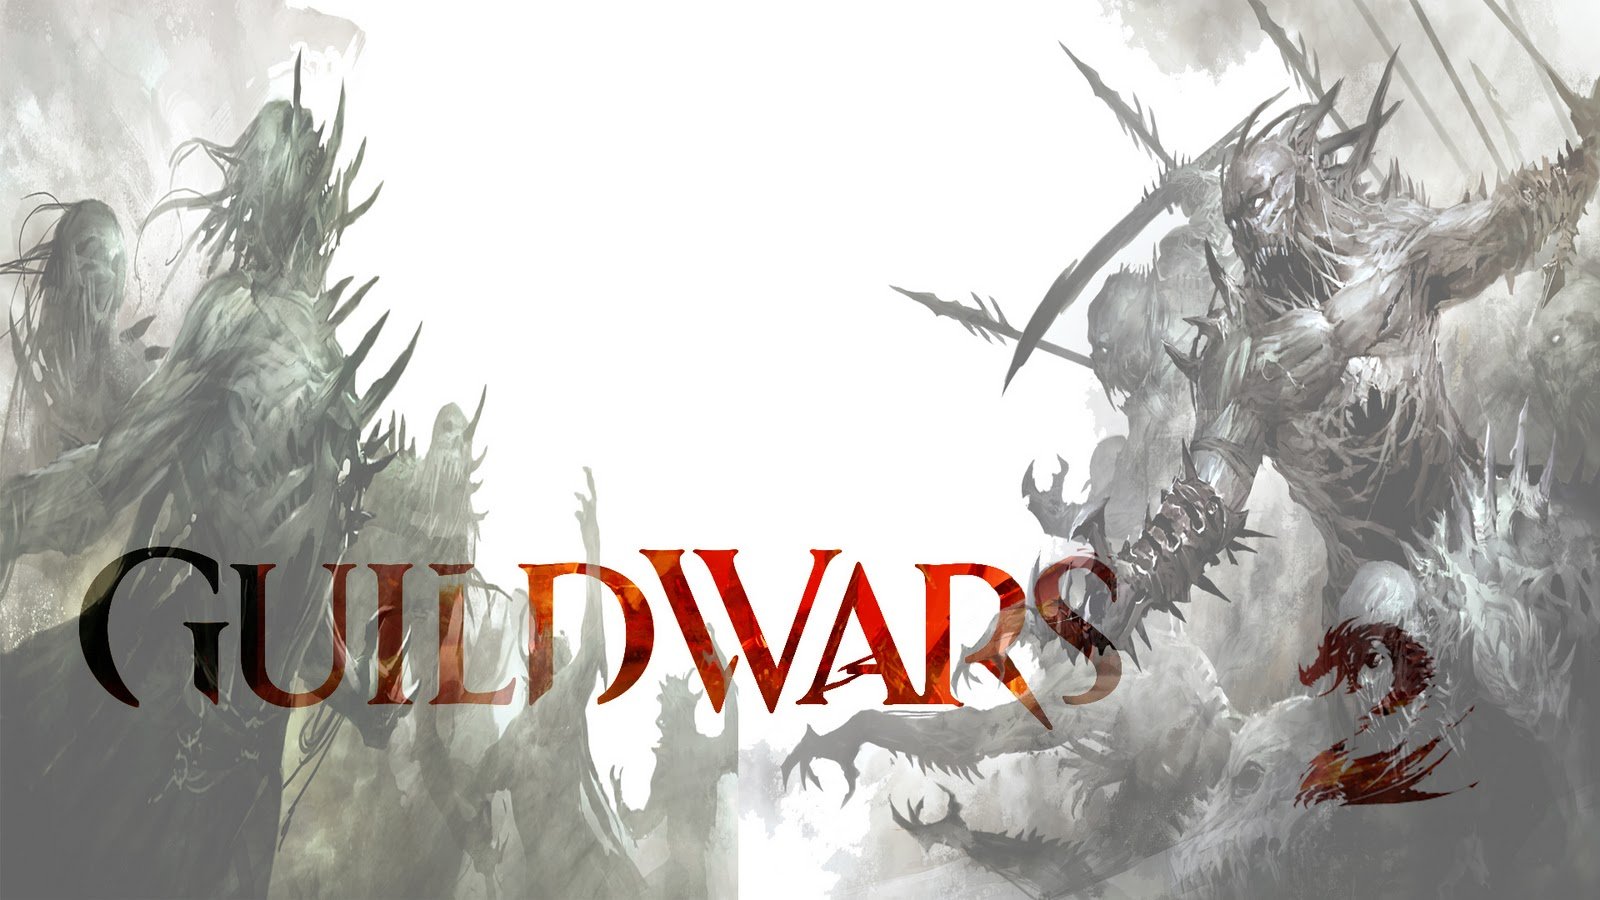 http://4.bp.blogspot.com/_nw5usl_lKrI/TOXuVQxm_WI/AAAAAAAAAAY/Ttu2HqCH4uc/s1600/Guild+Wars+2+Wallpaper+s.jpg